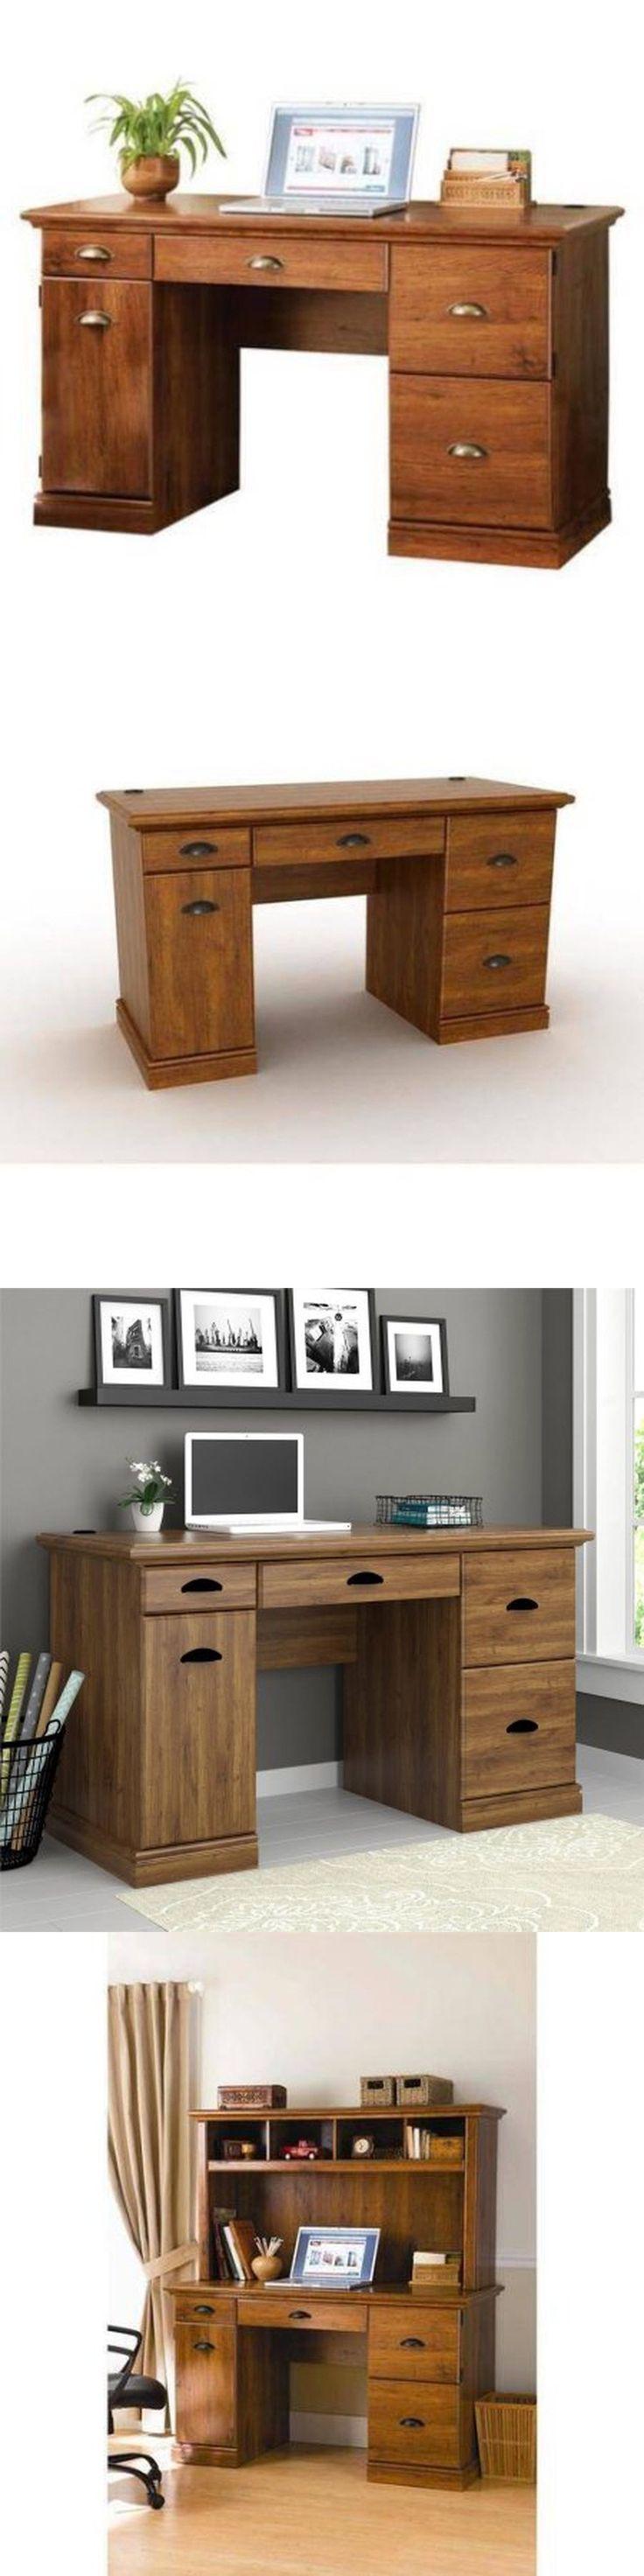 Buy vancouver expressions linen mirror rectangular online cfs uk - Office Furniture Computer Desk Workstation Drawer Table Wood Furniture Office Home Storage New